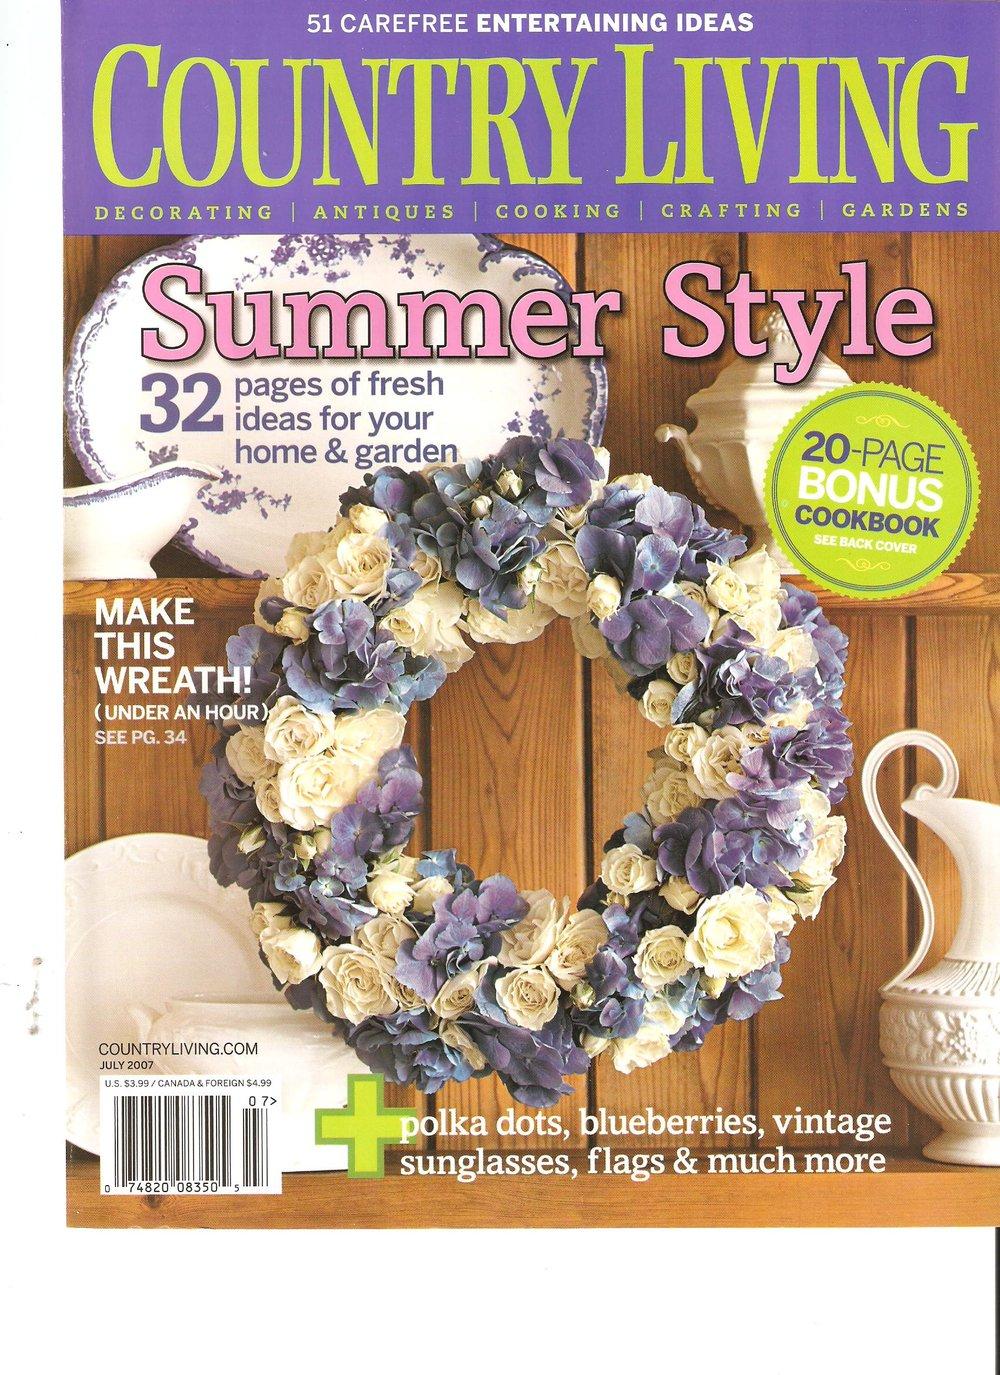 country living magazine cover.jpg